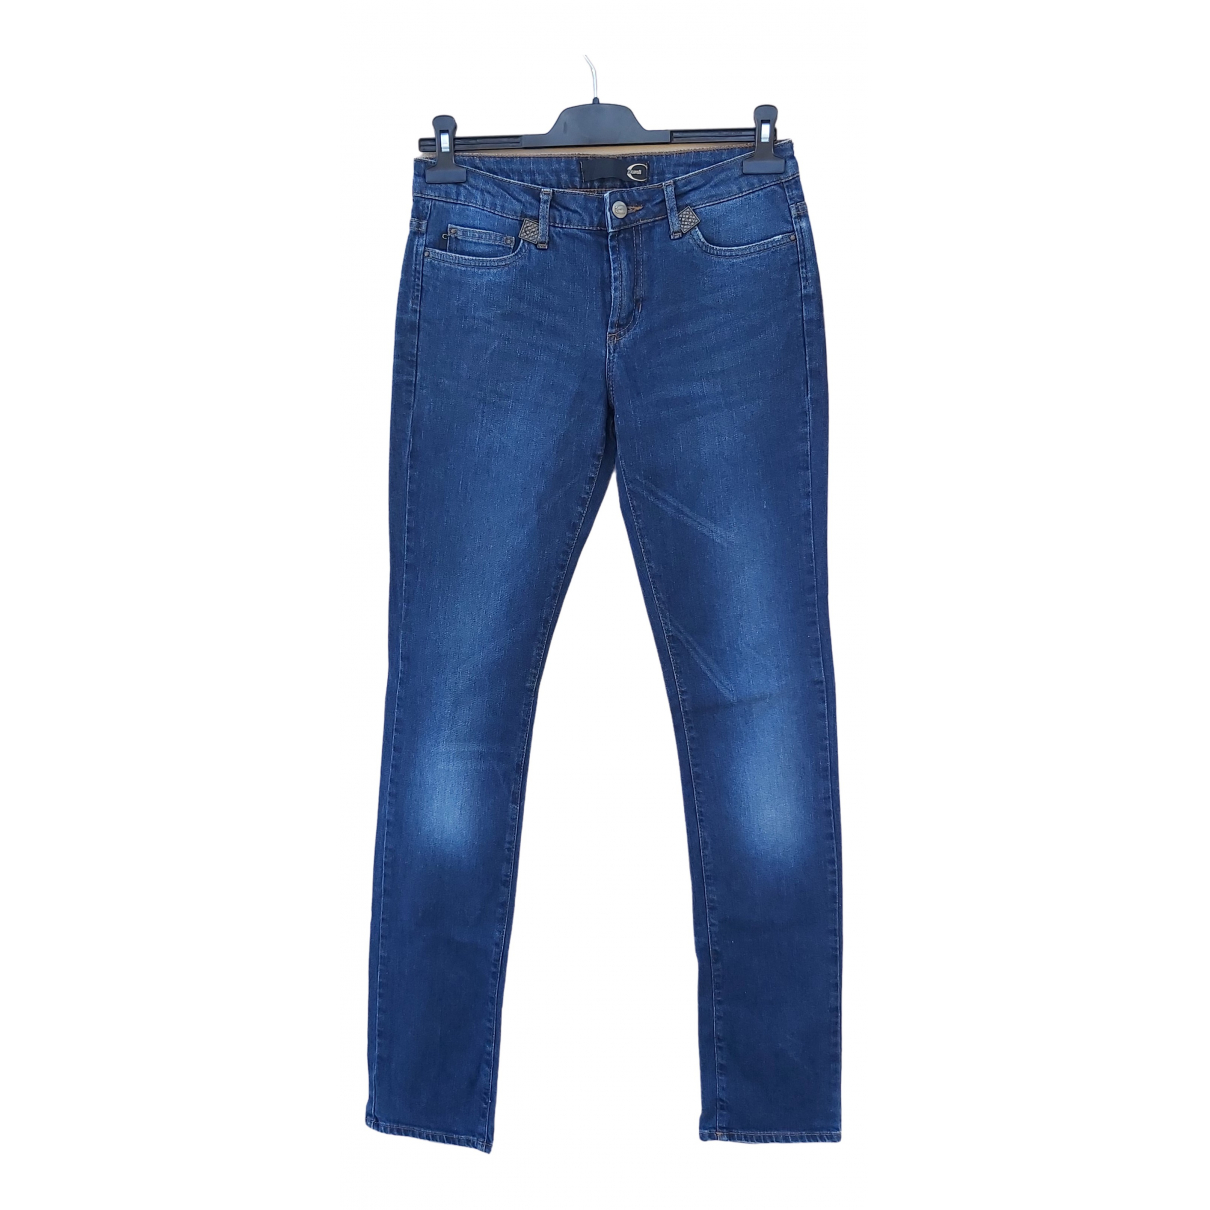 Just Cavalli \N Blue Cotton - elasthane Jeans for Women 38 FR